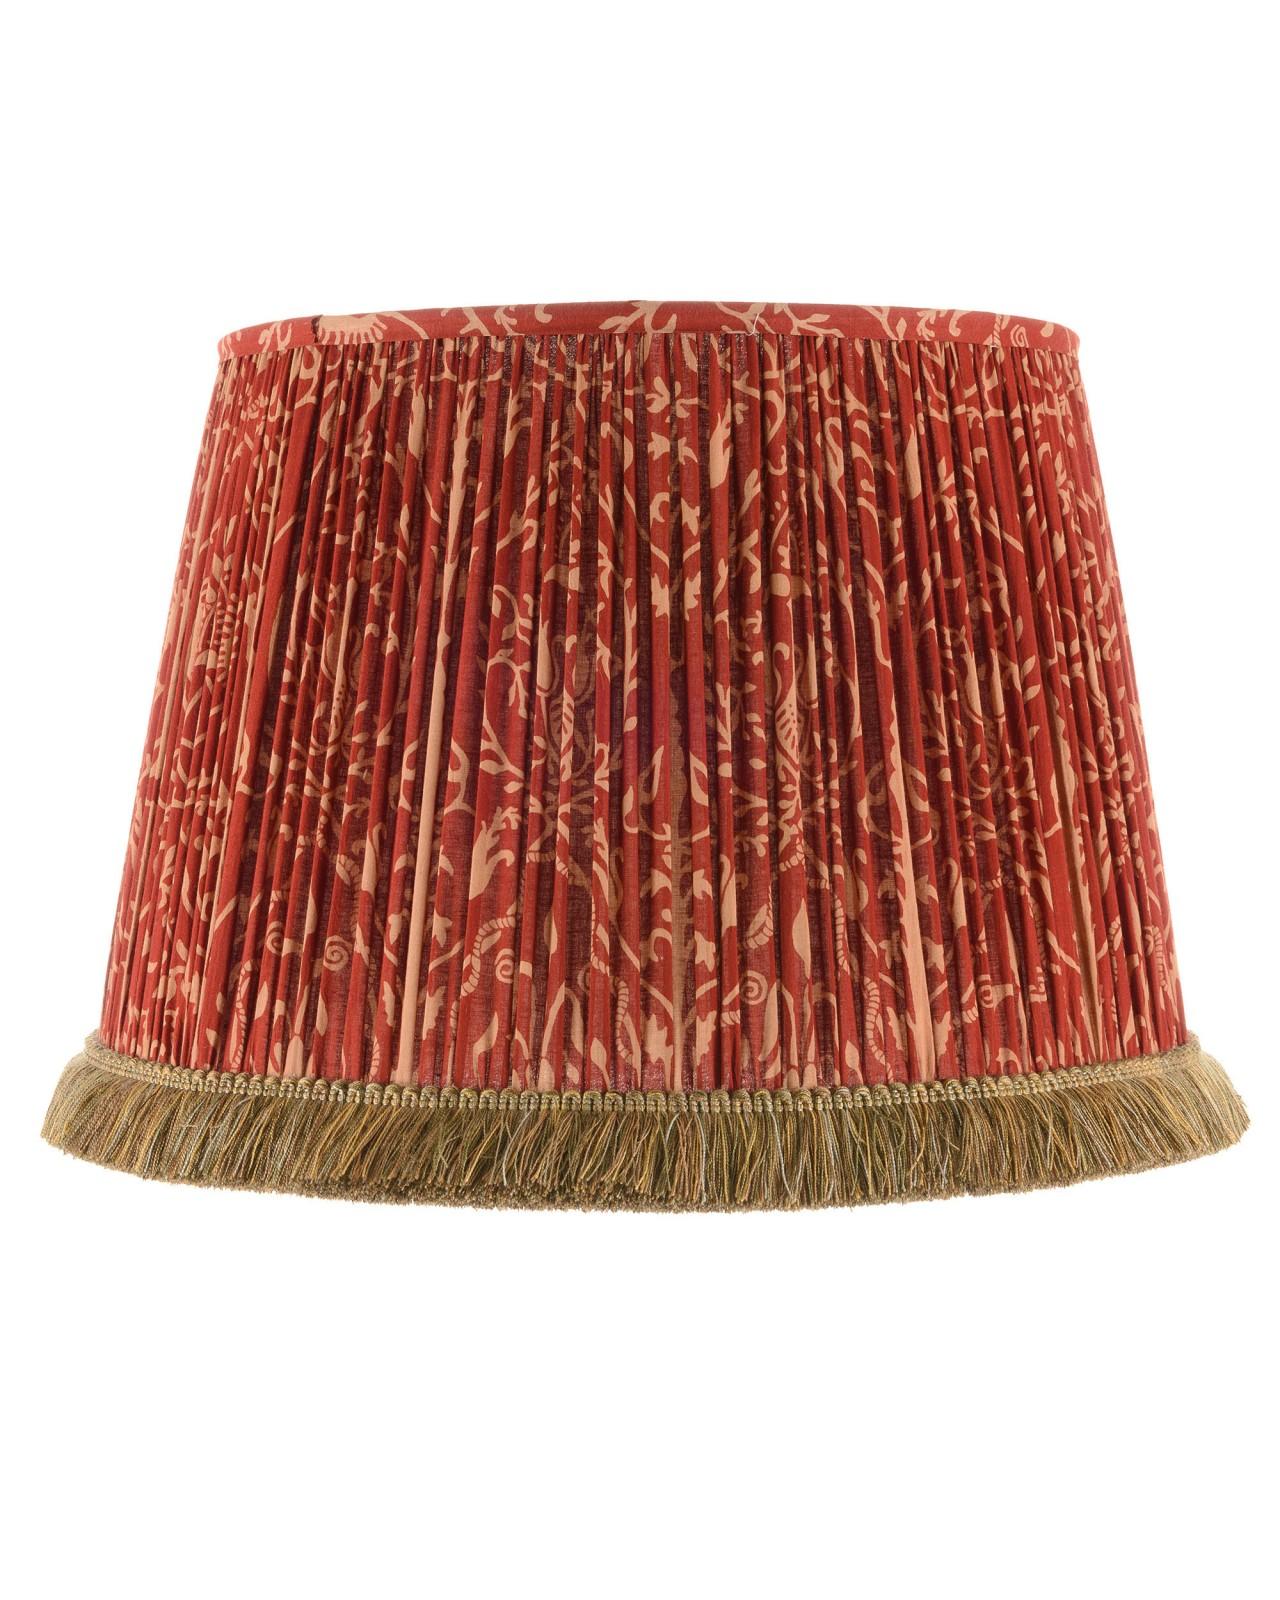 SAXON ORNAMENT Pleated Lampshade